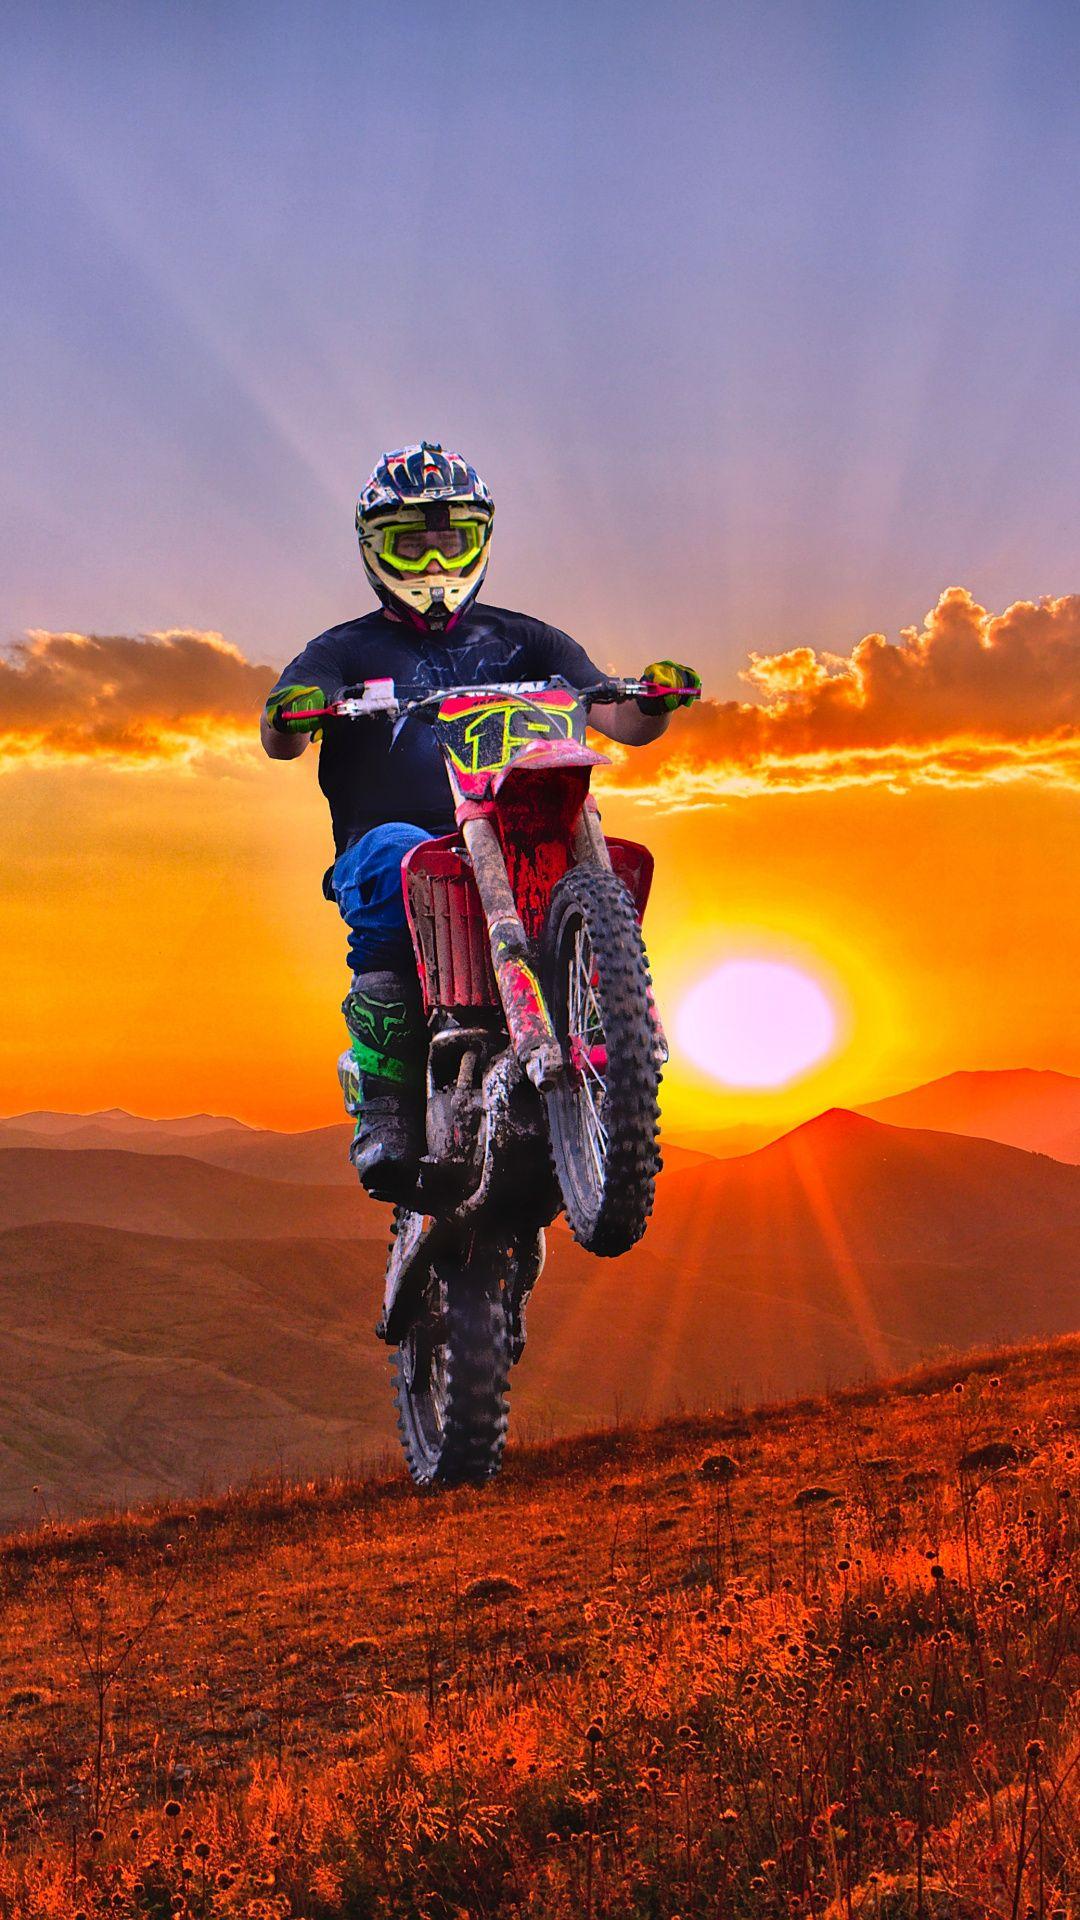 Wallpapers motocross, enduro, sunset, bicycle, motorcycle